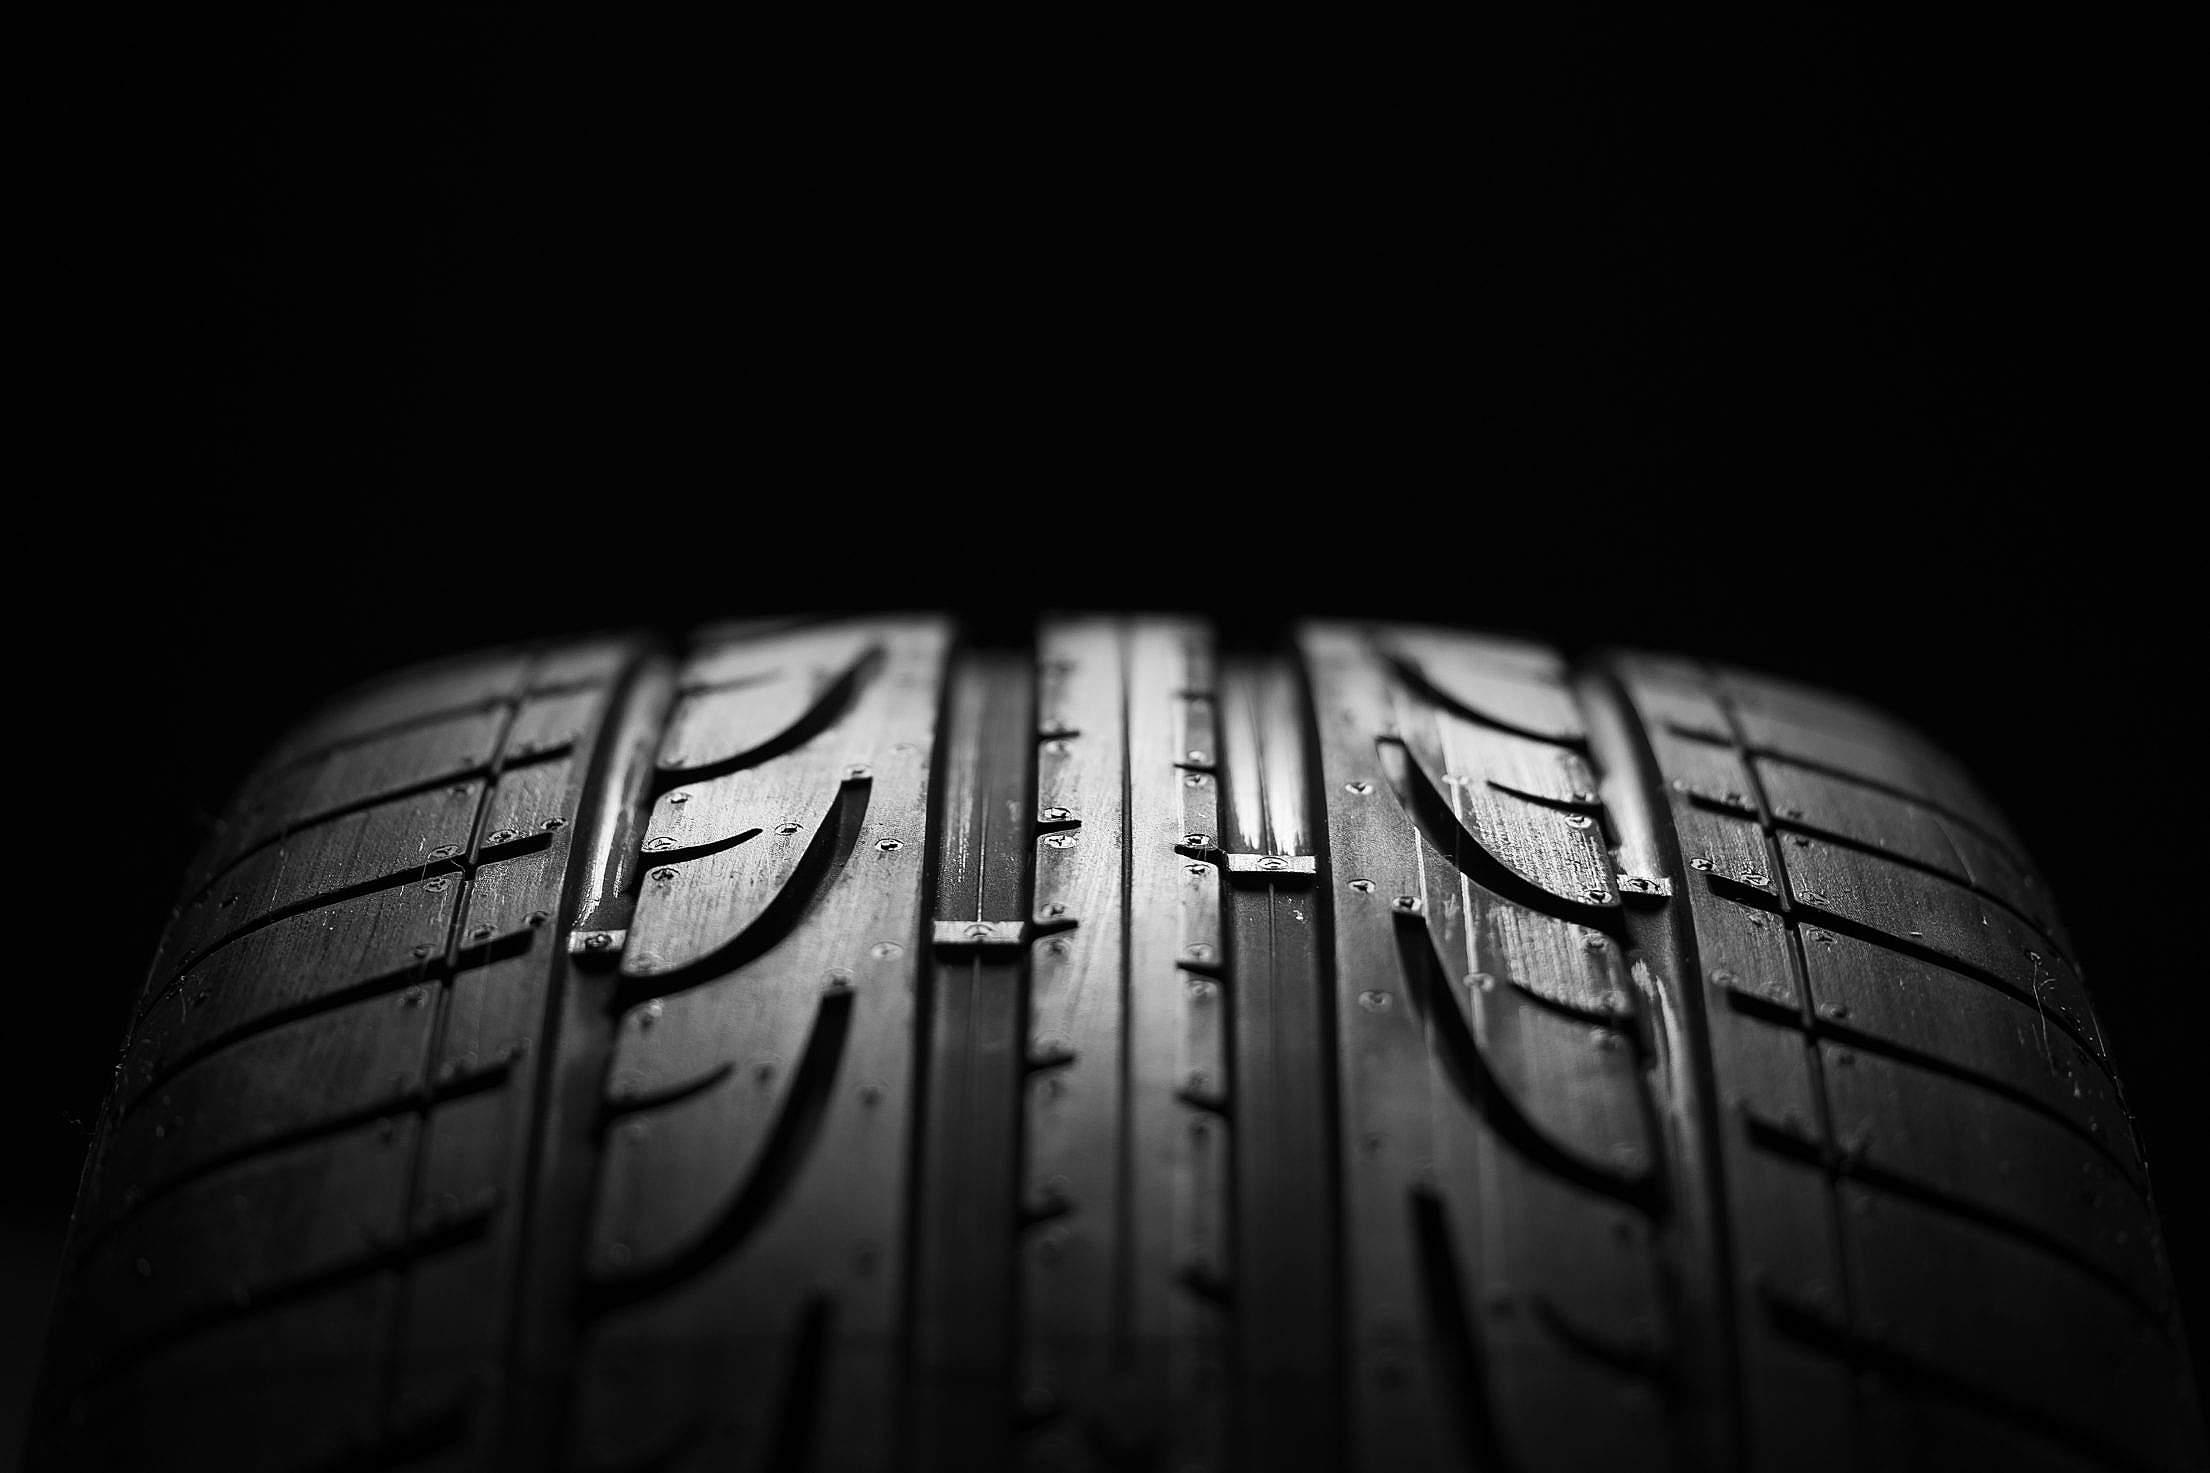 Tire Tread Pattern Close Up Free Stock Photo